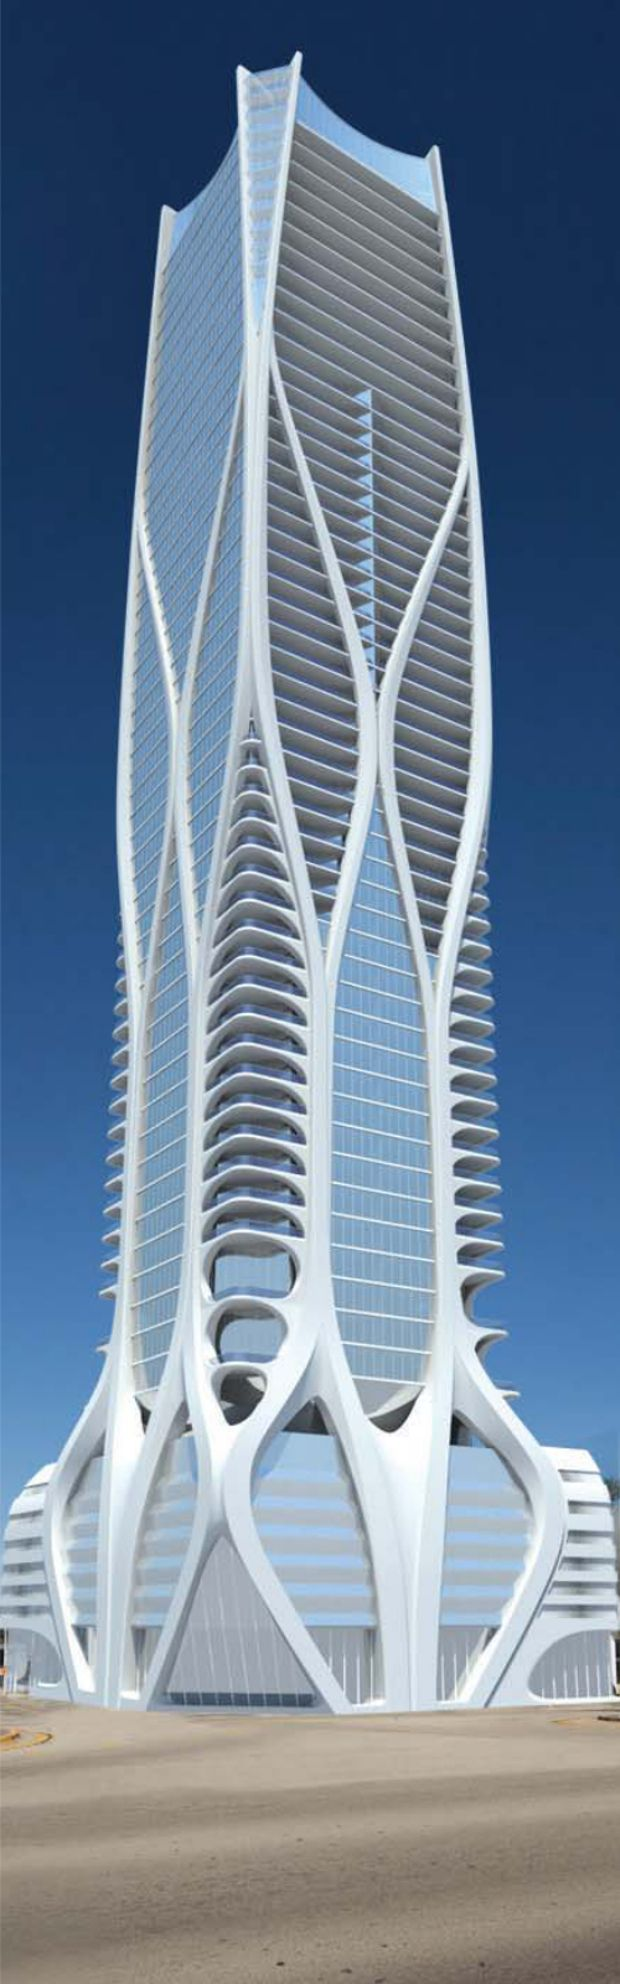 Departamentos en Miami - ONE THOUSAND MUSEUM - Torre de alta gama torres alta gama